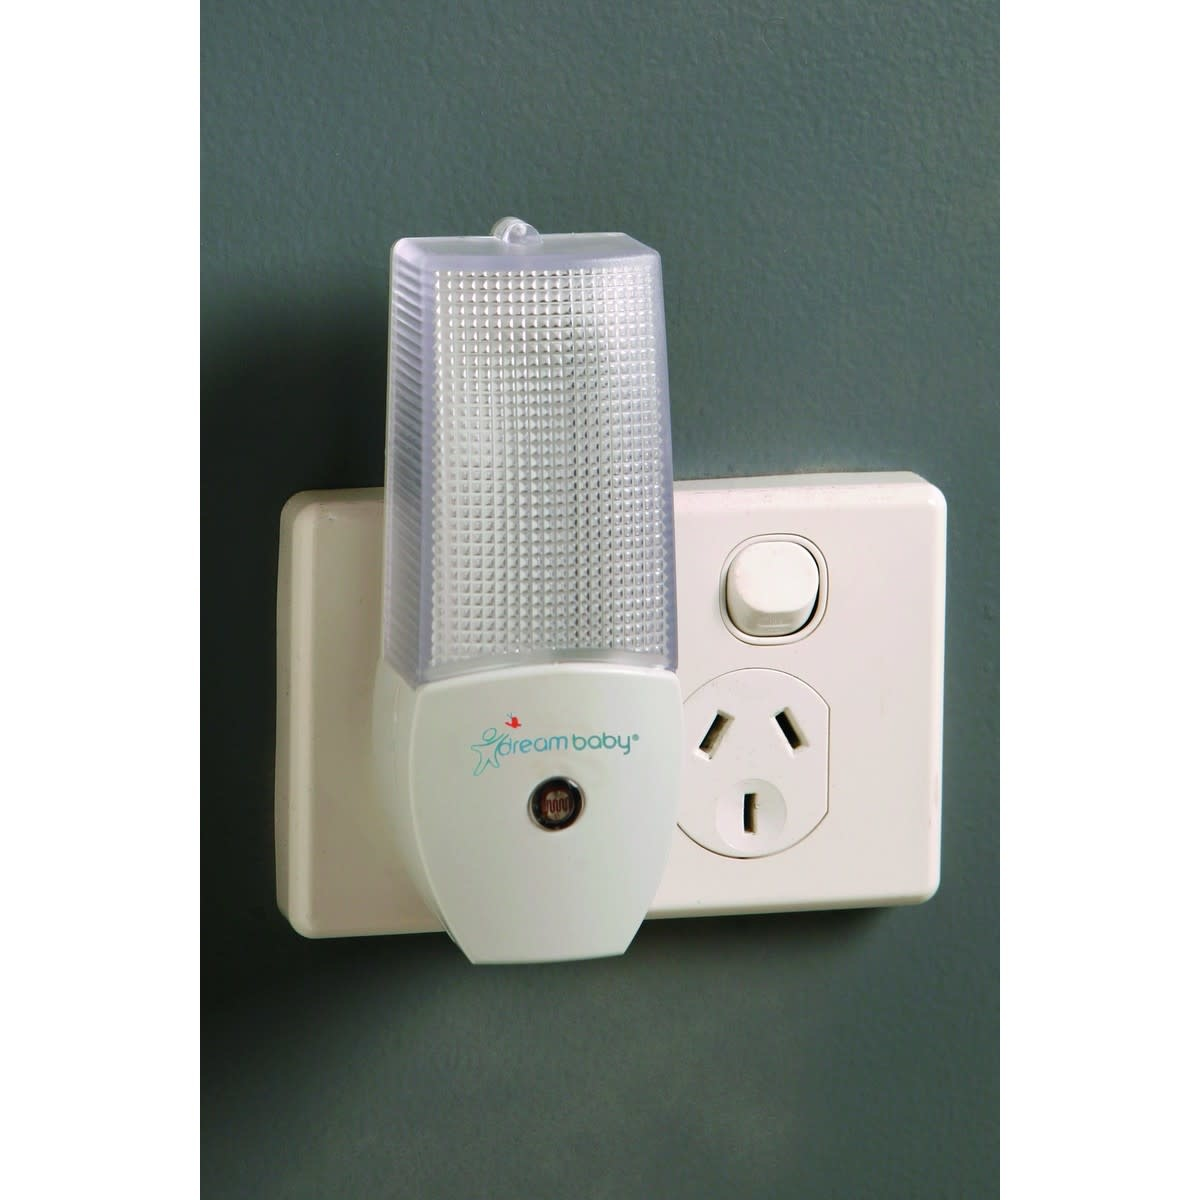 Dreambaby DreamBaby Auto Sensor Led Night Light 3 Pack